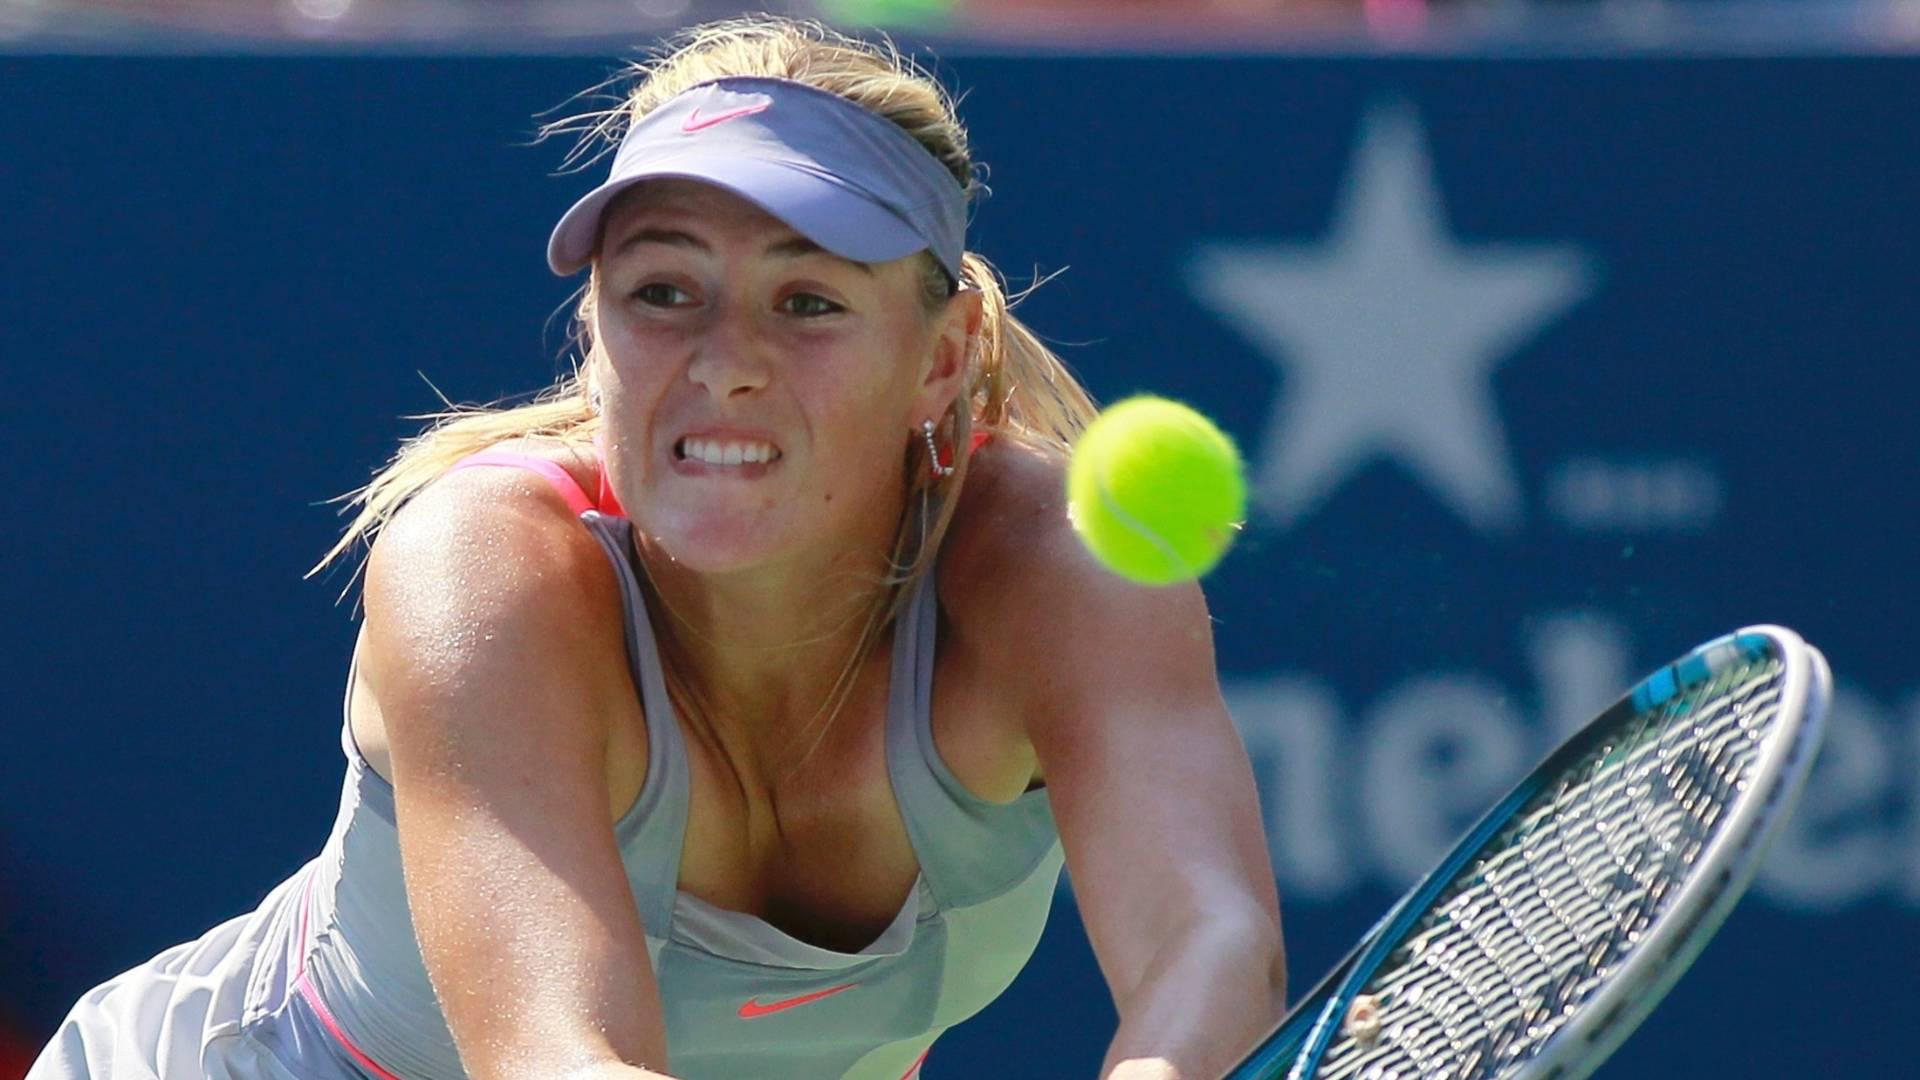 Maria Sharapova tenta defender ataque de adversária na terceira rodada do US Open (02/09/2011)